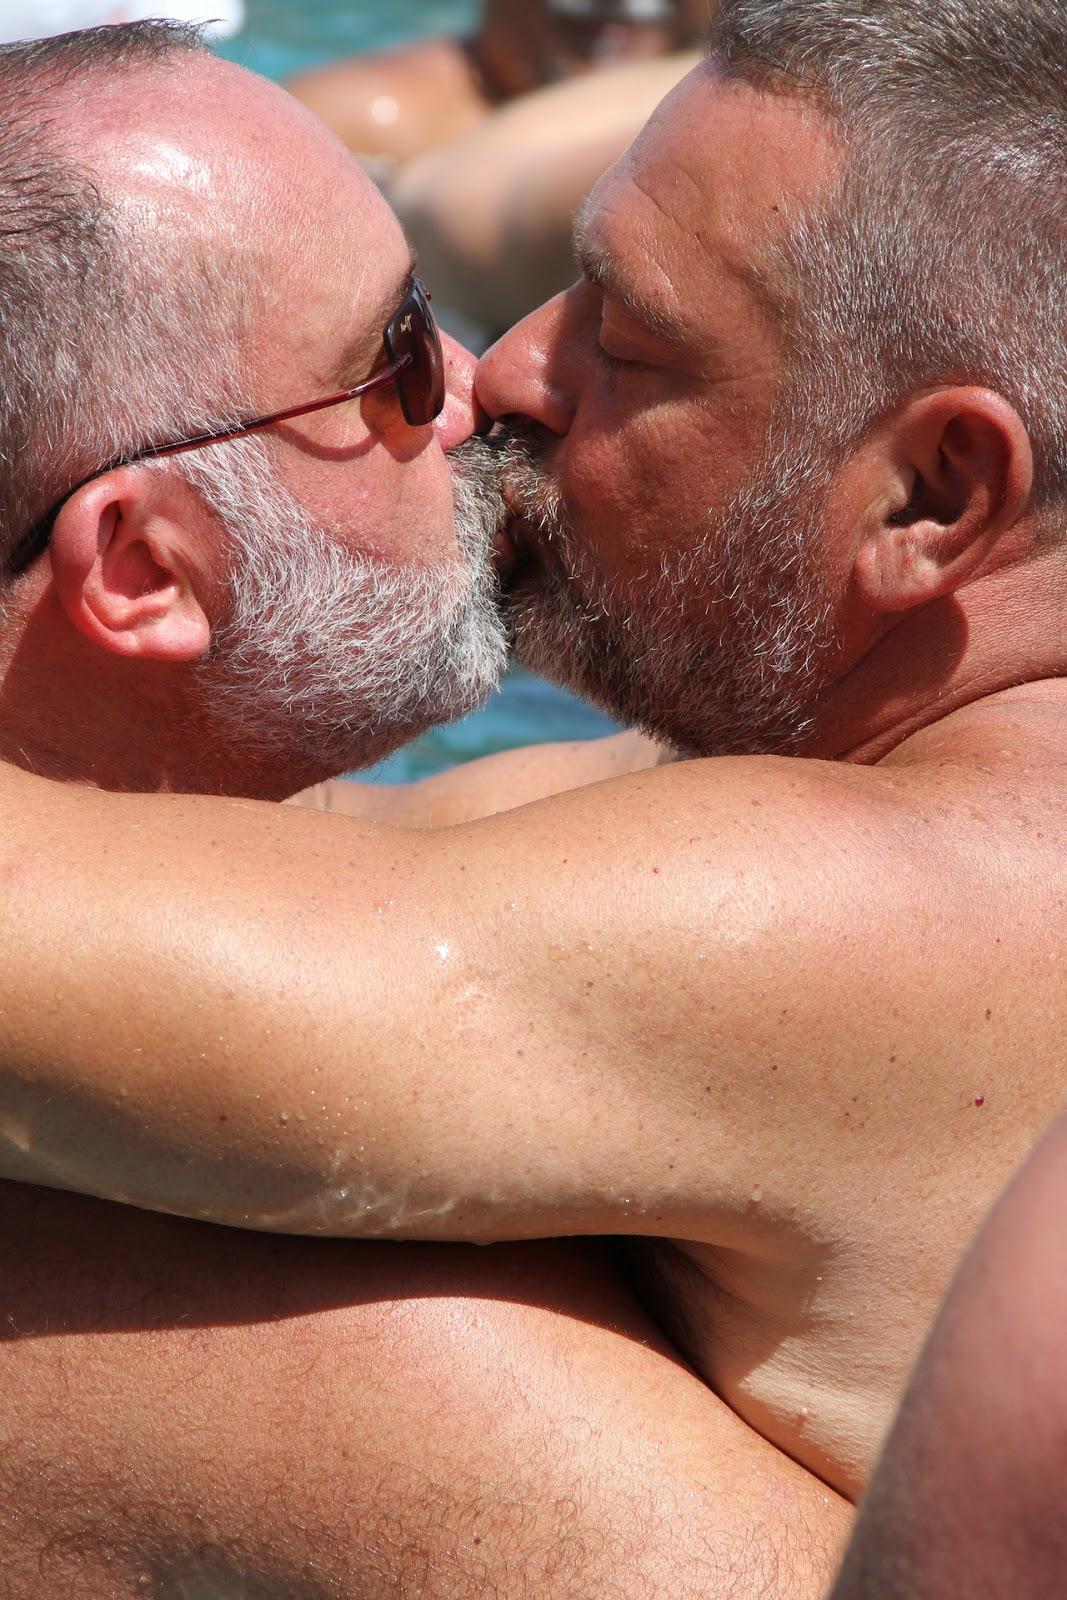 Maduros Homens Gostosos Nus